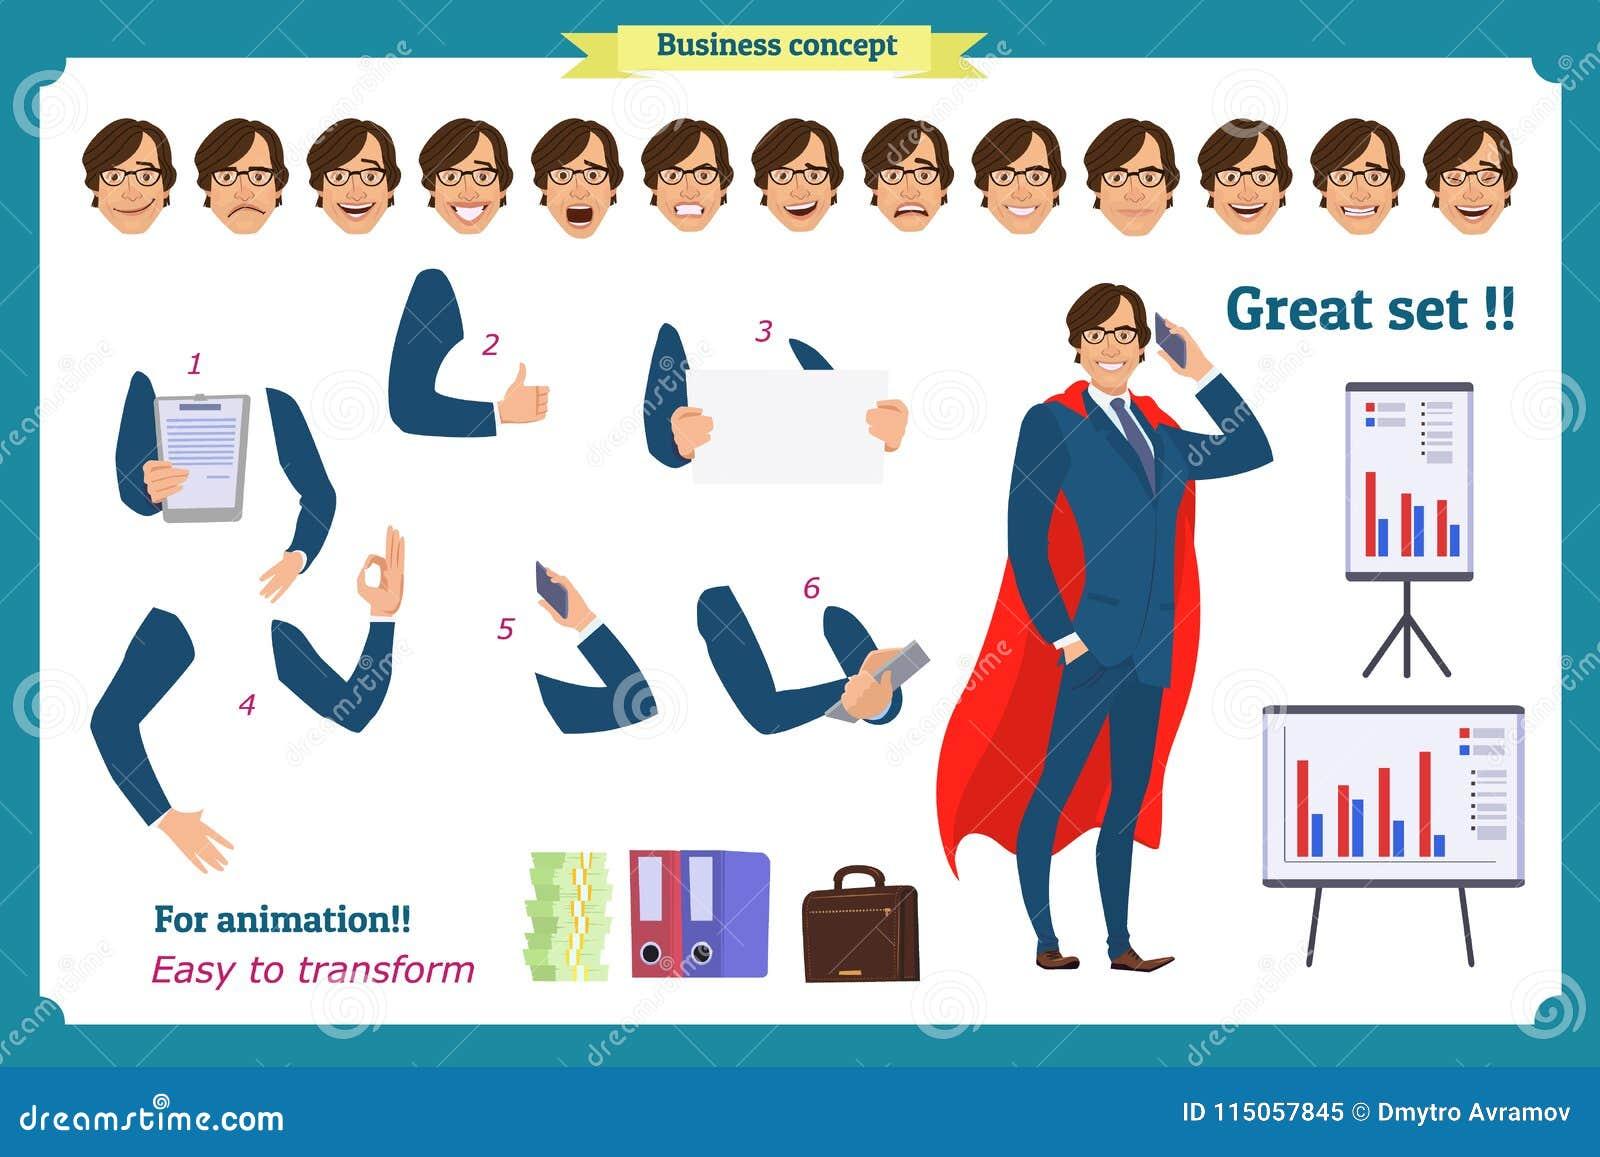 Комплект супер характера бизнесмена представляет, жесты, действия, элементы тела